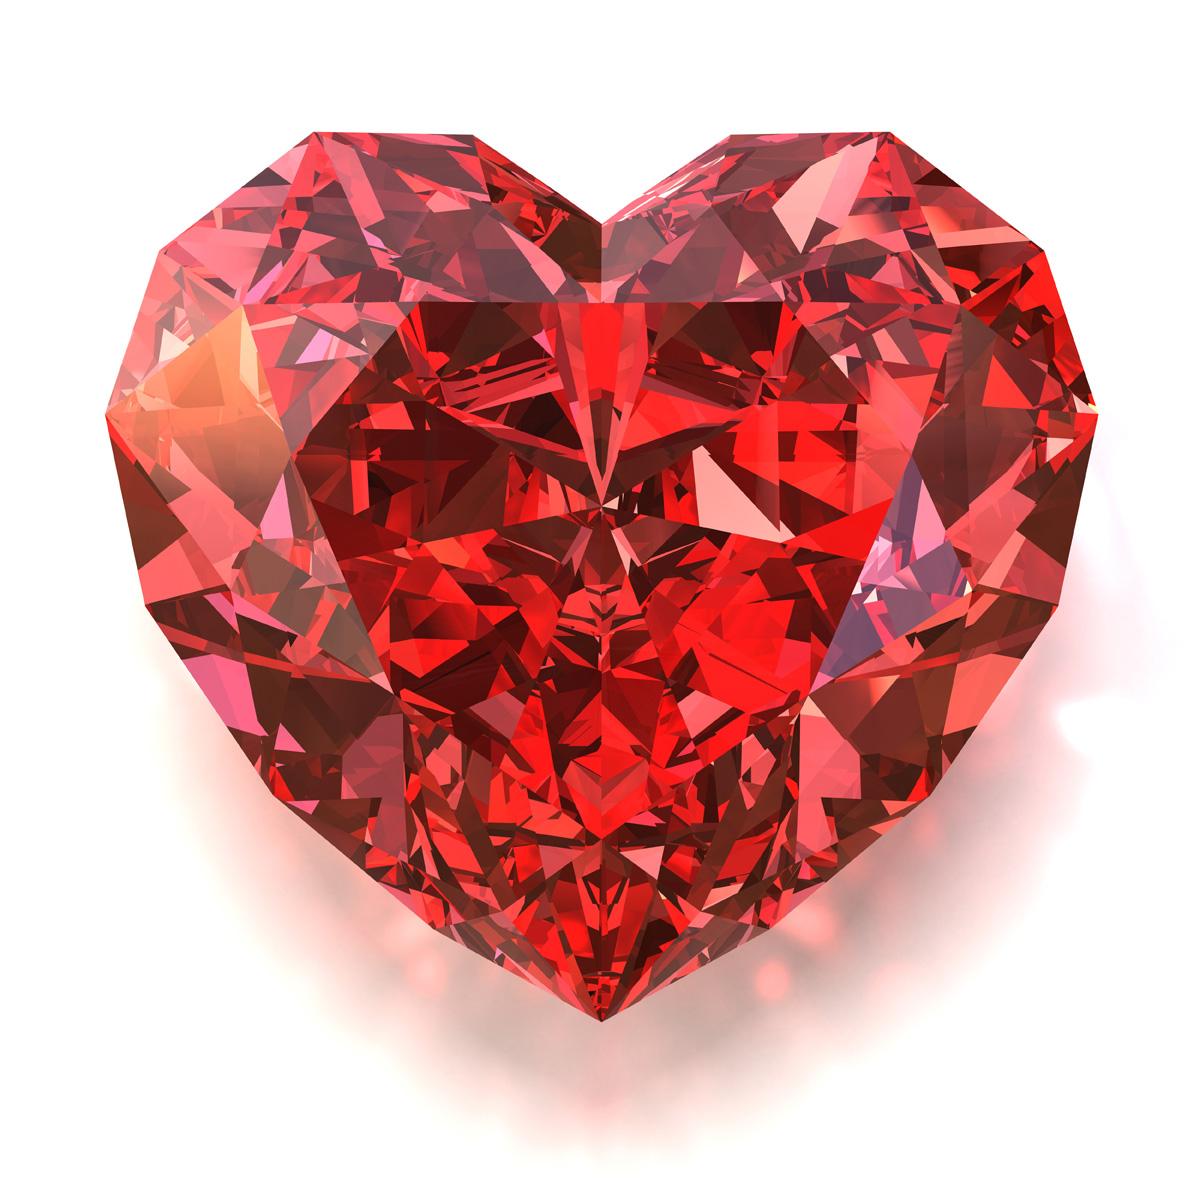 Heart-shaped clipart diamond shape Heart diamond No ruby tattoo